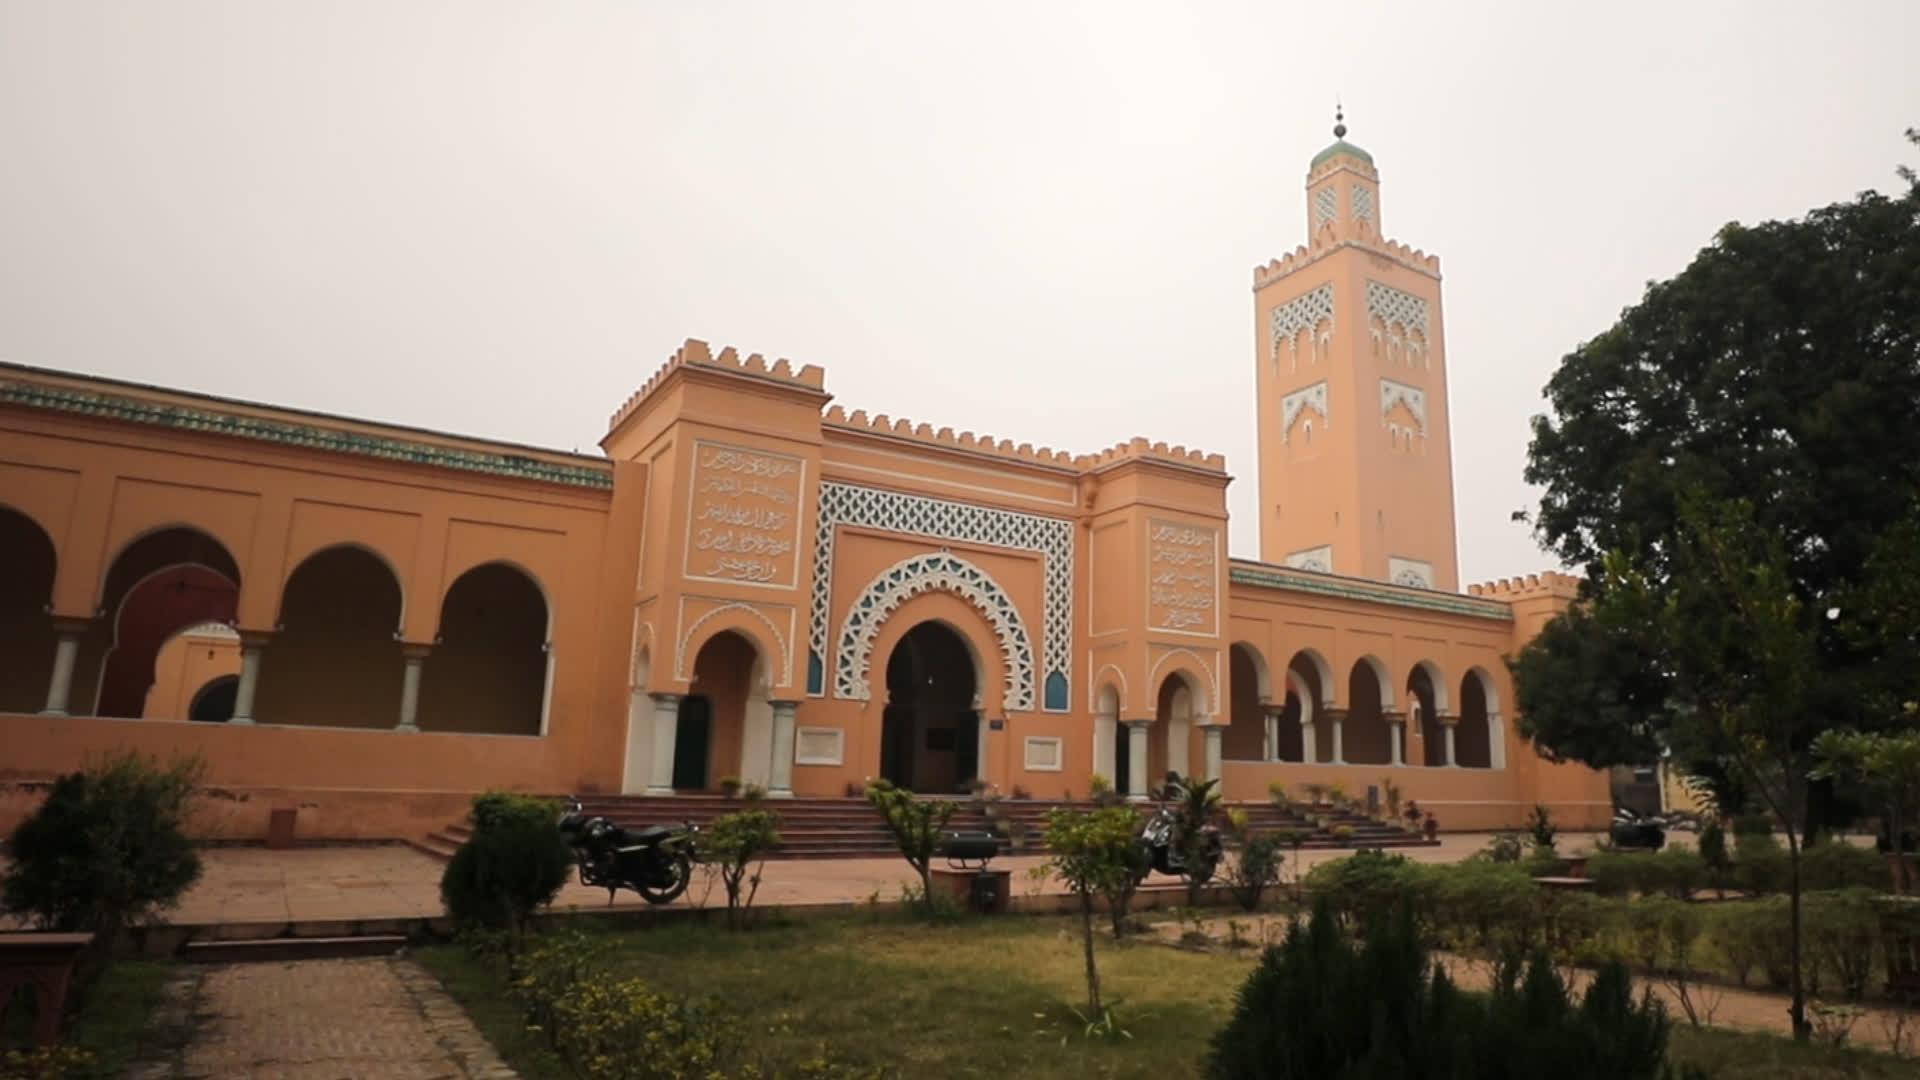 The Moorish Mosque of Kapurthala, Punjab